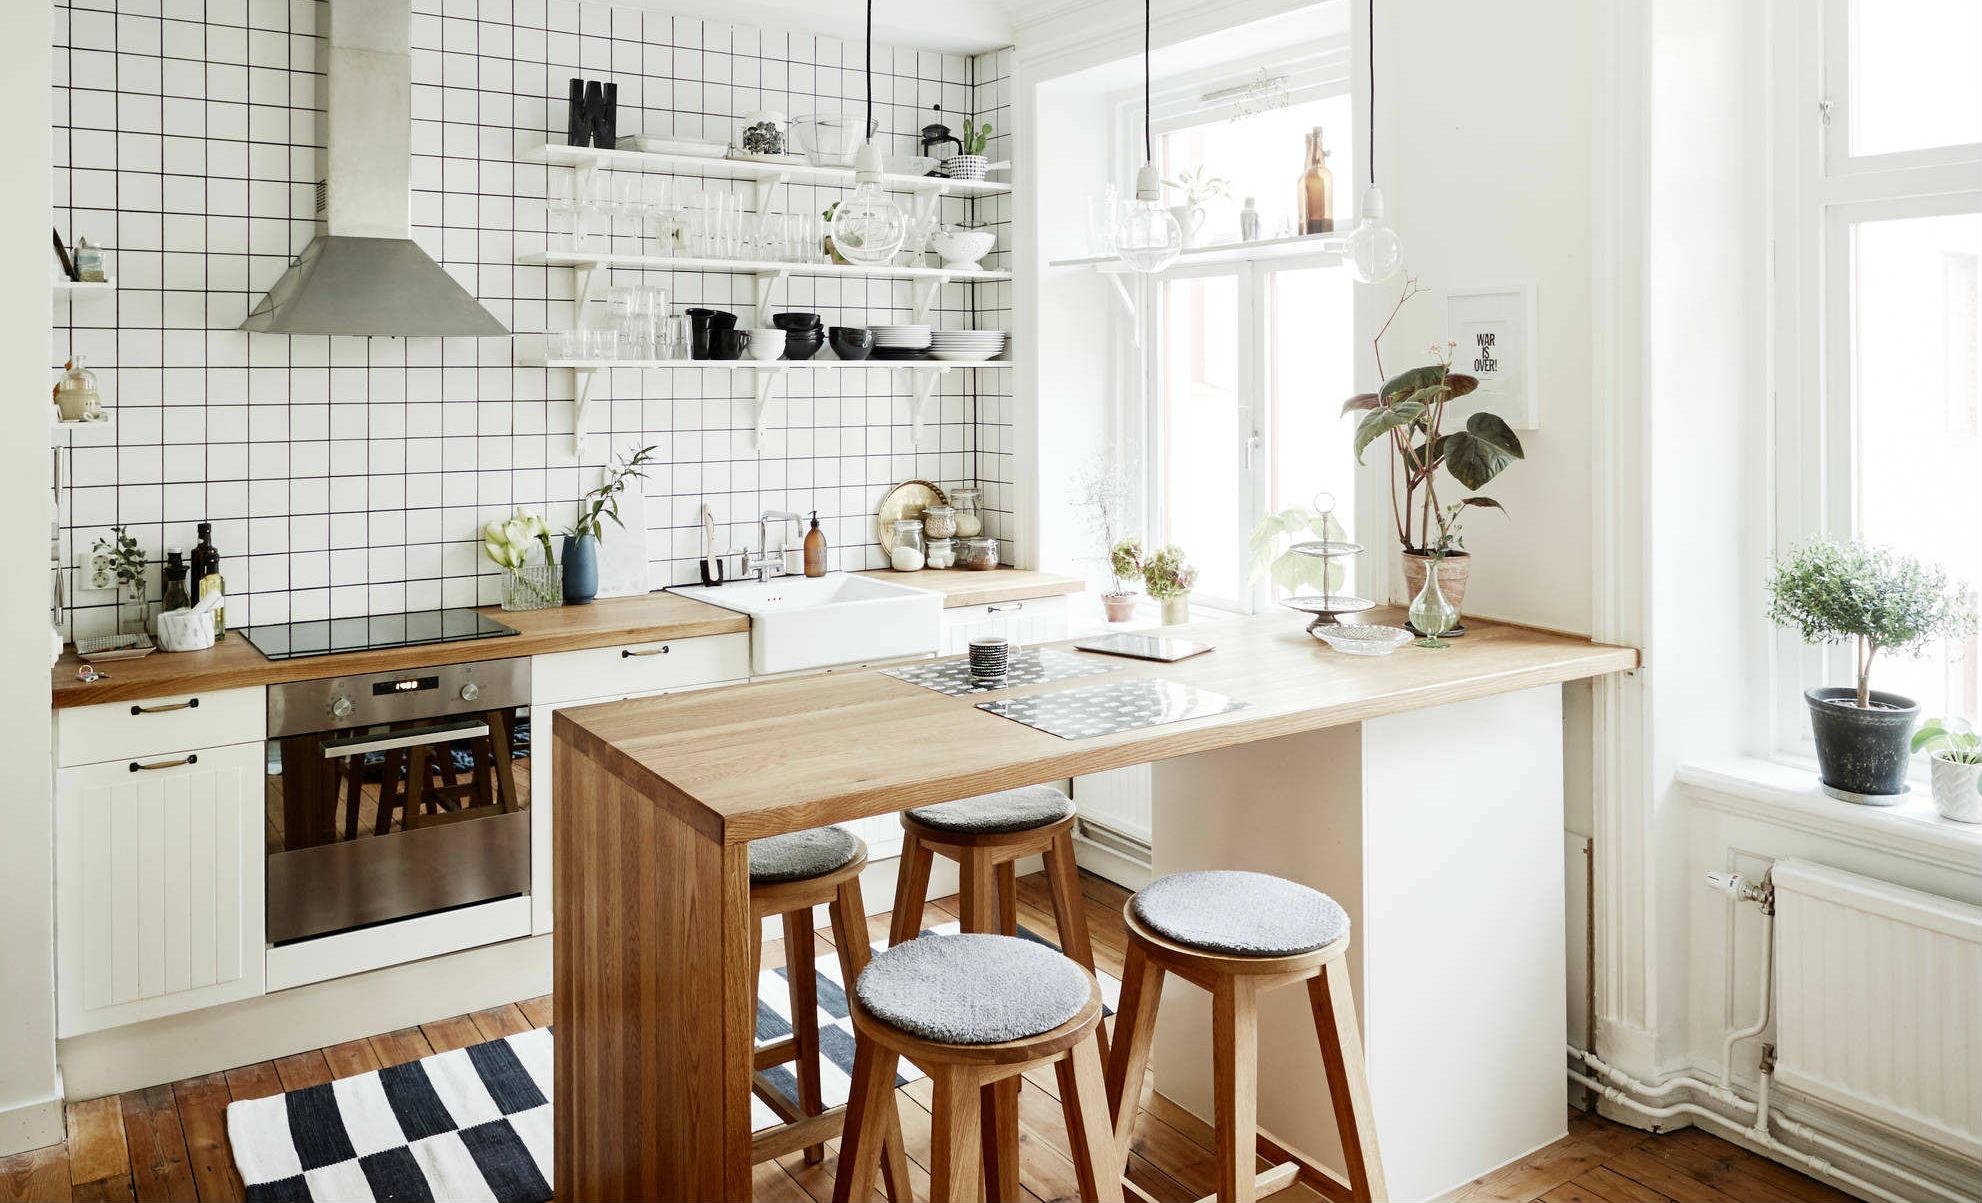 İskandinav Mutfak Dekorasyonu